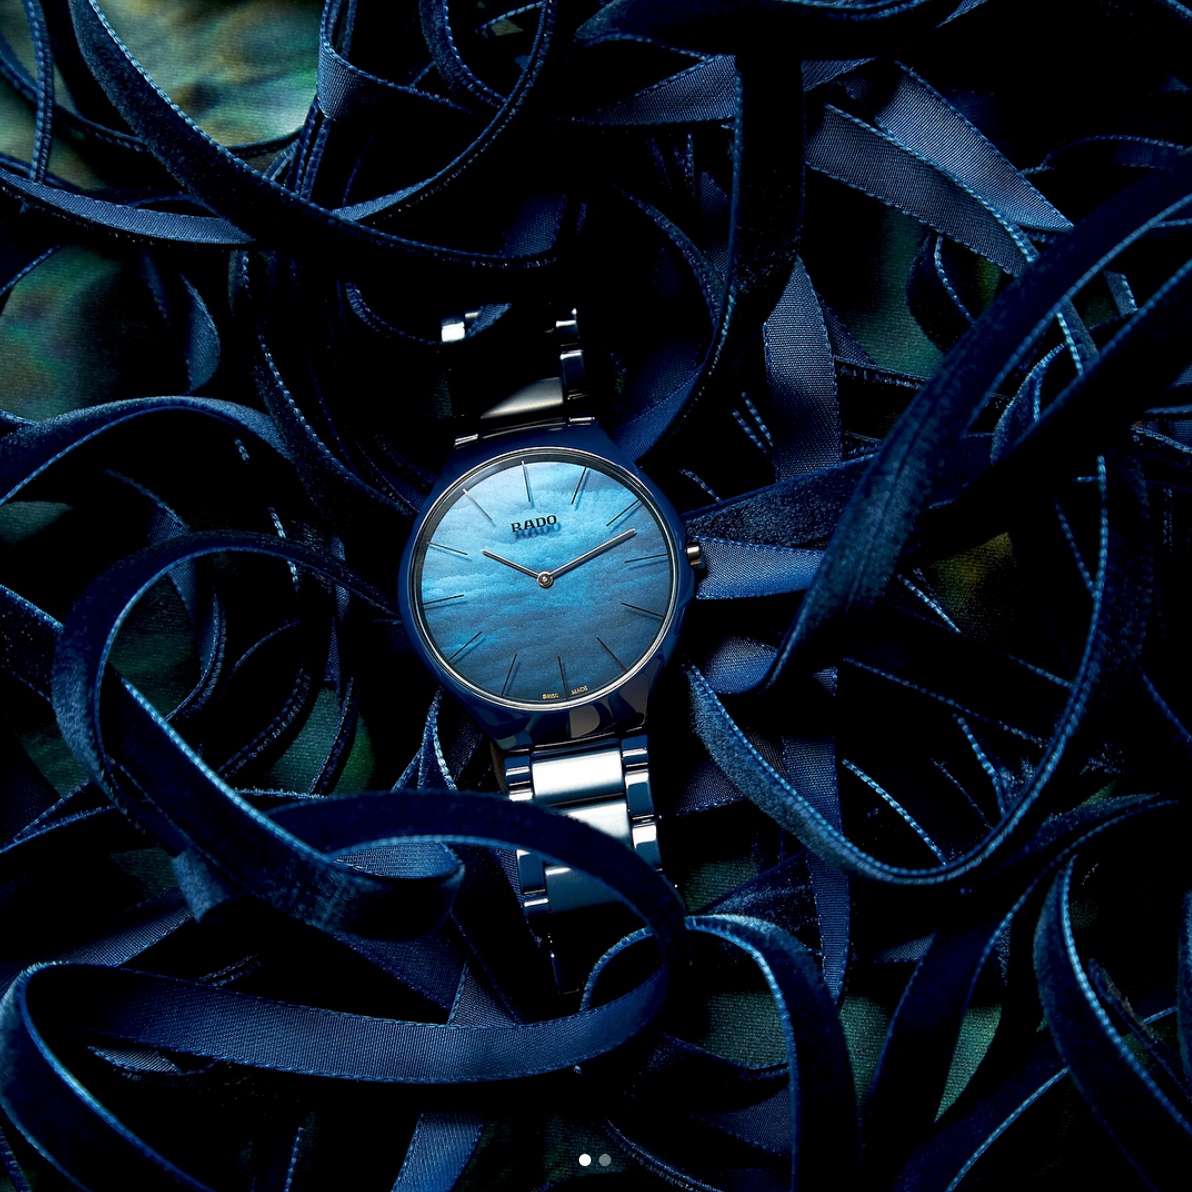 【RADO ラドー】True Thinline Water/トゥルーシンライン(ウォーターブルー)/正規輸入品